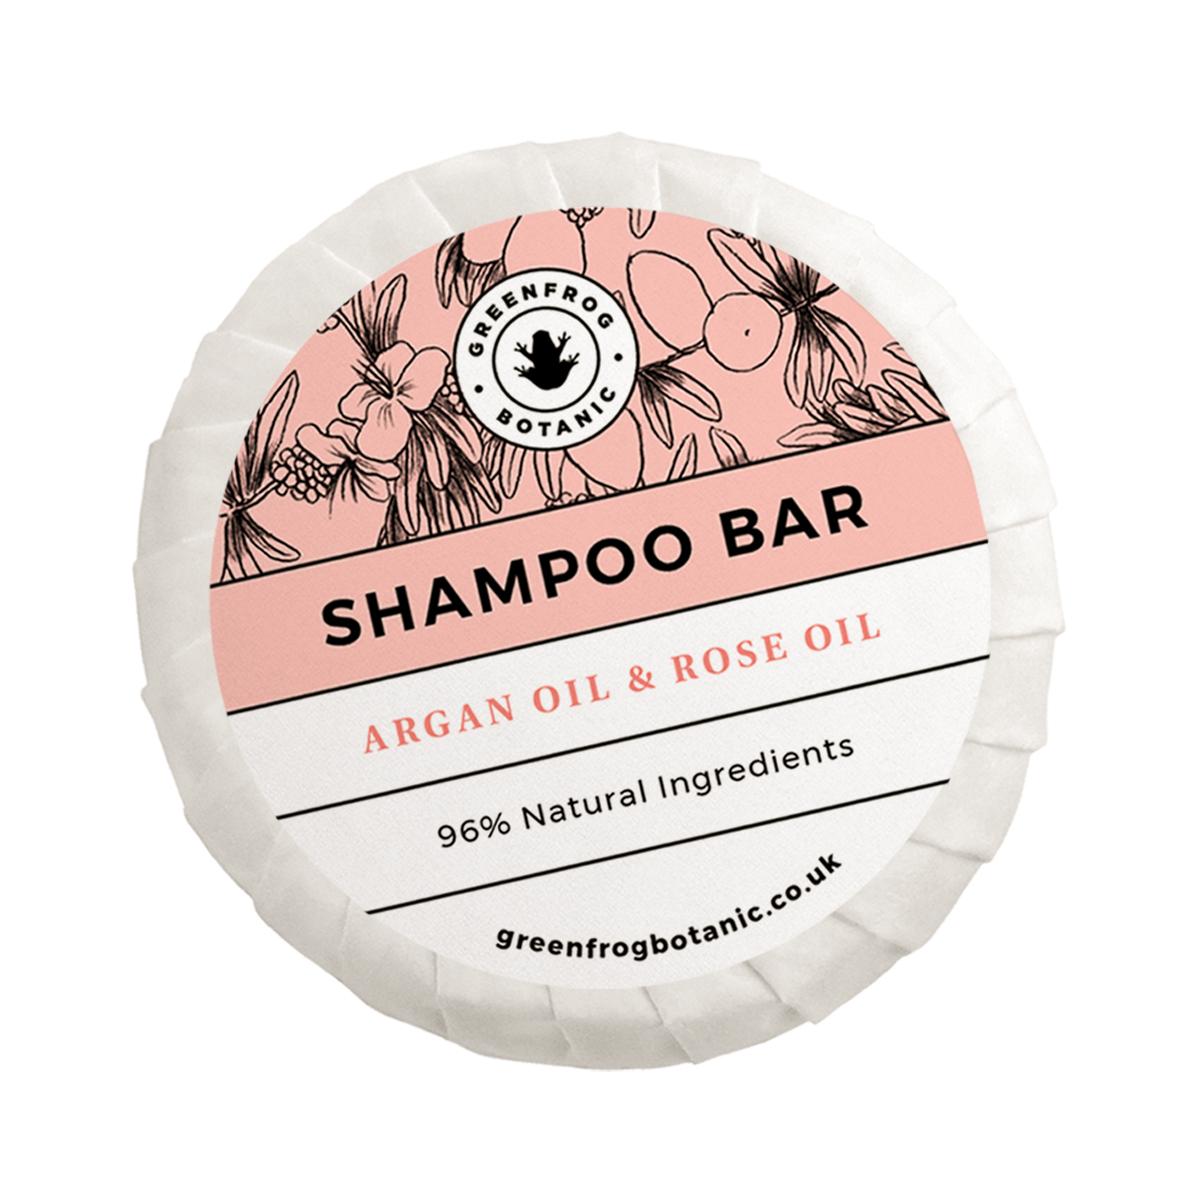 Shampoo Bar Argan Oil & Rose Oil 50g